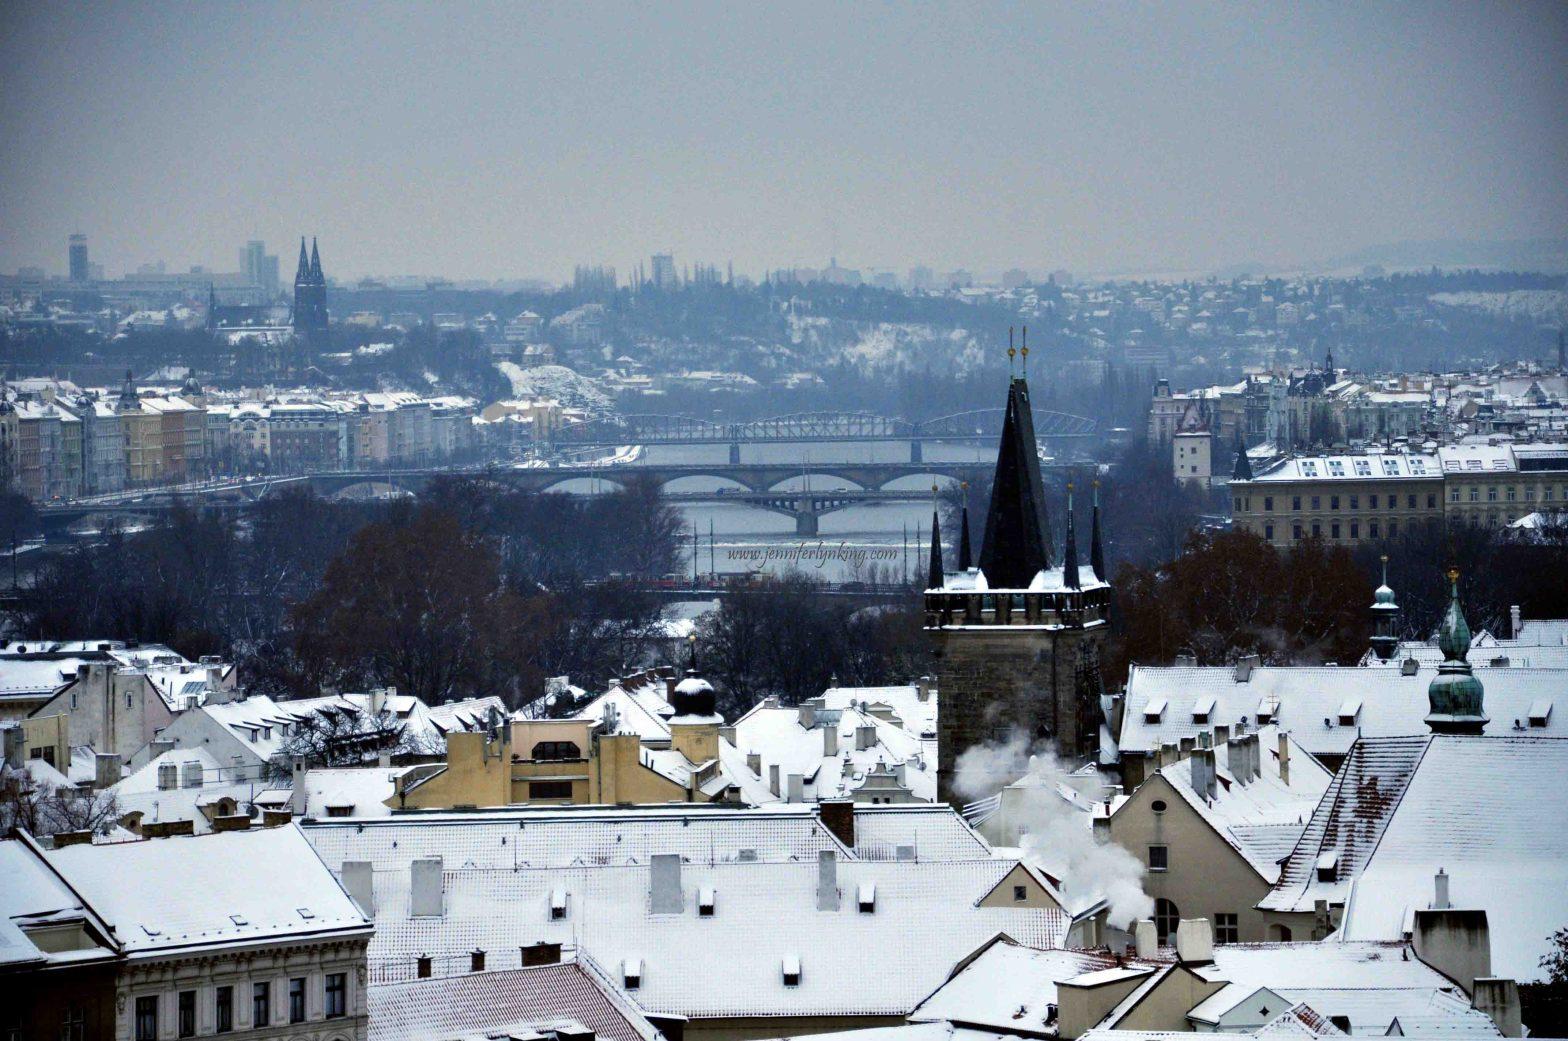 Prague's Spires and Bridges with Snow in Winter